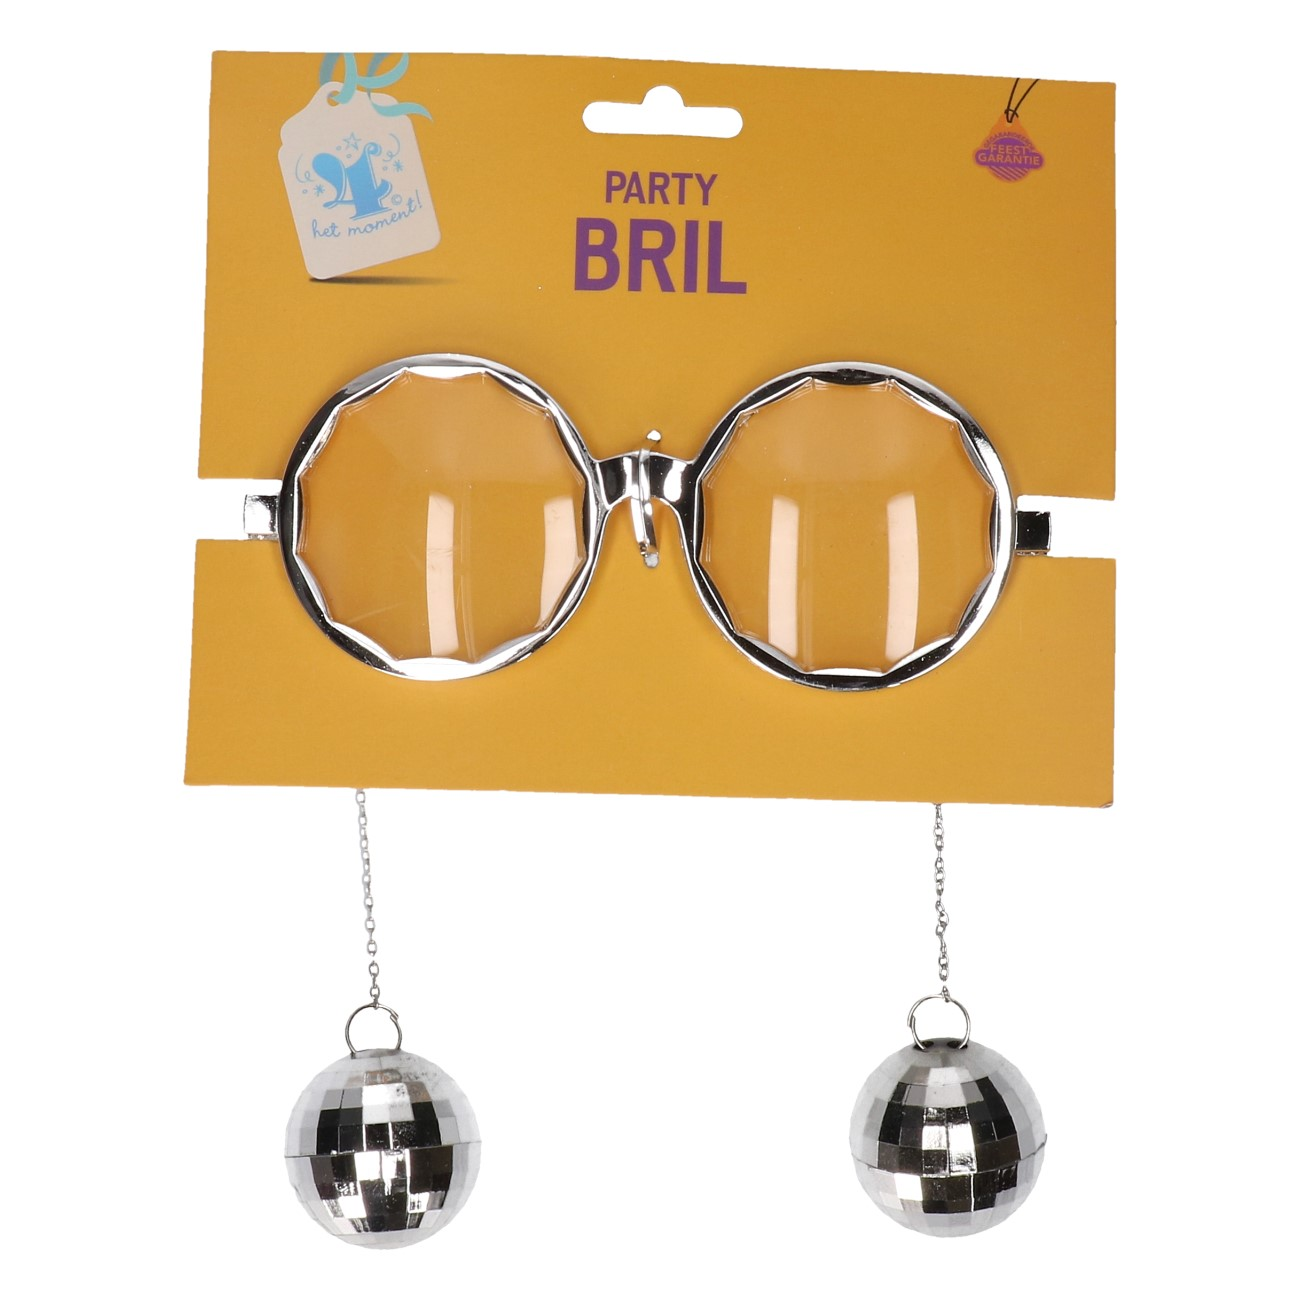 Partybril Discobal zilver #321